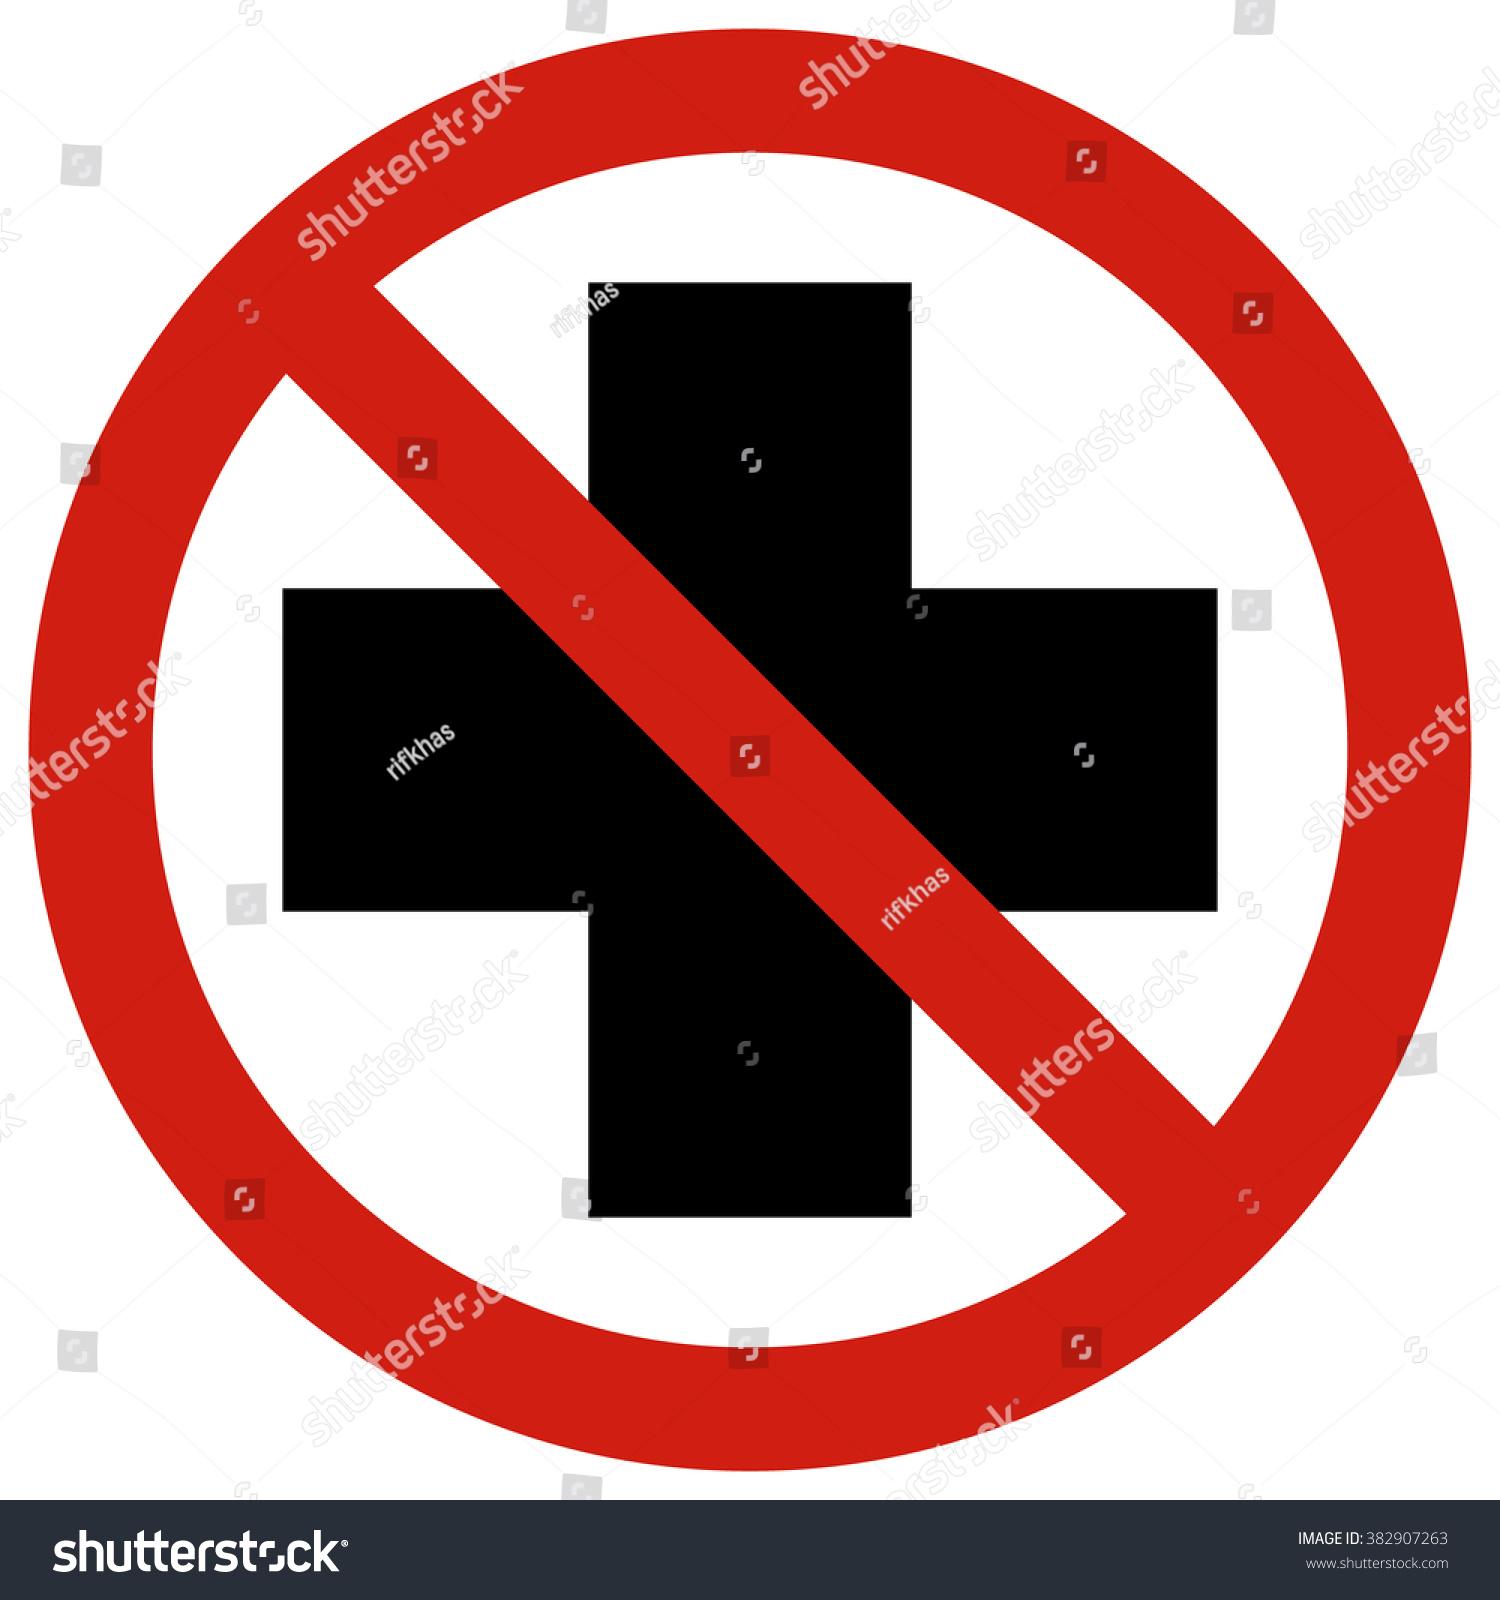 Medical Alert Symbols Signs Topsimages